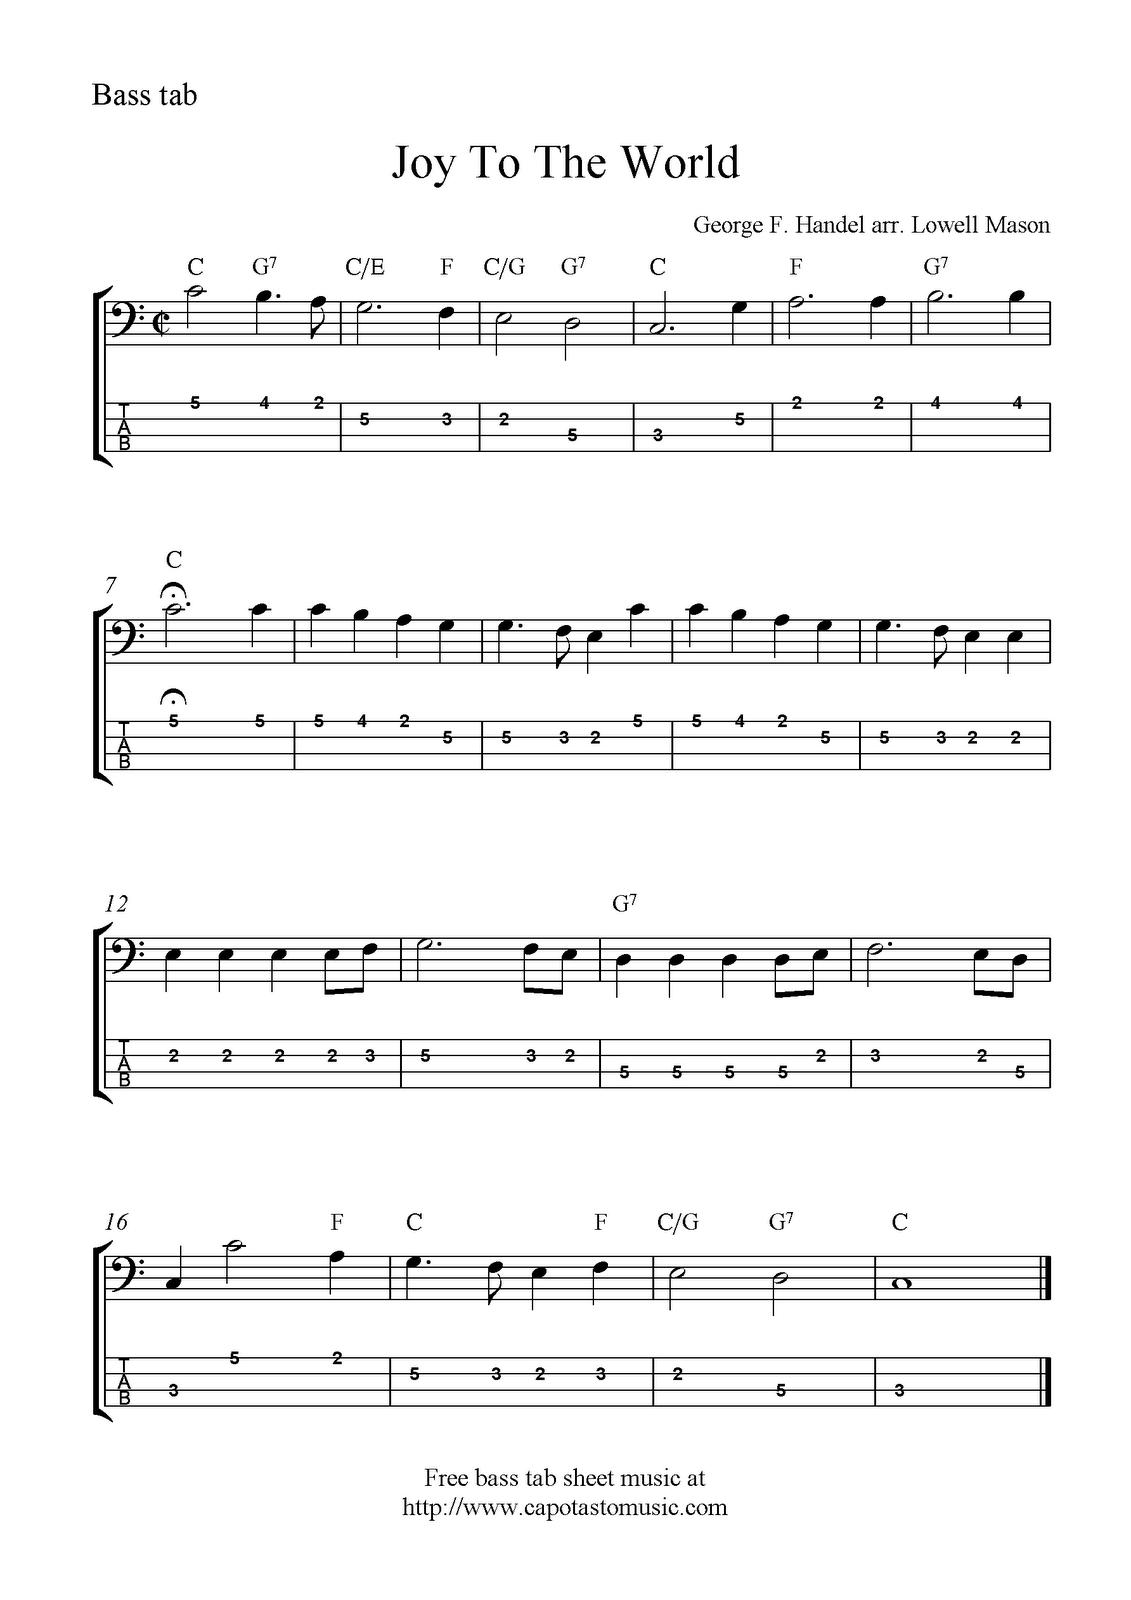 Joy To The World, free Christmas bass tab sheet music notes